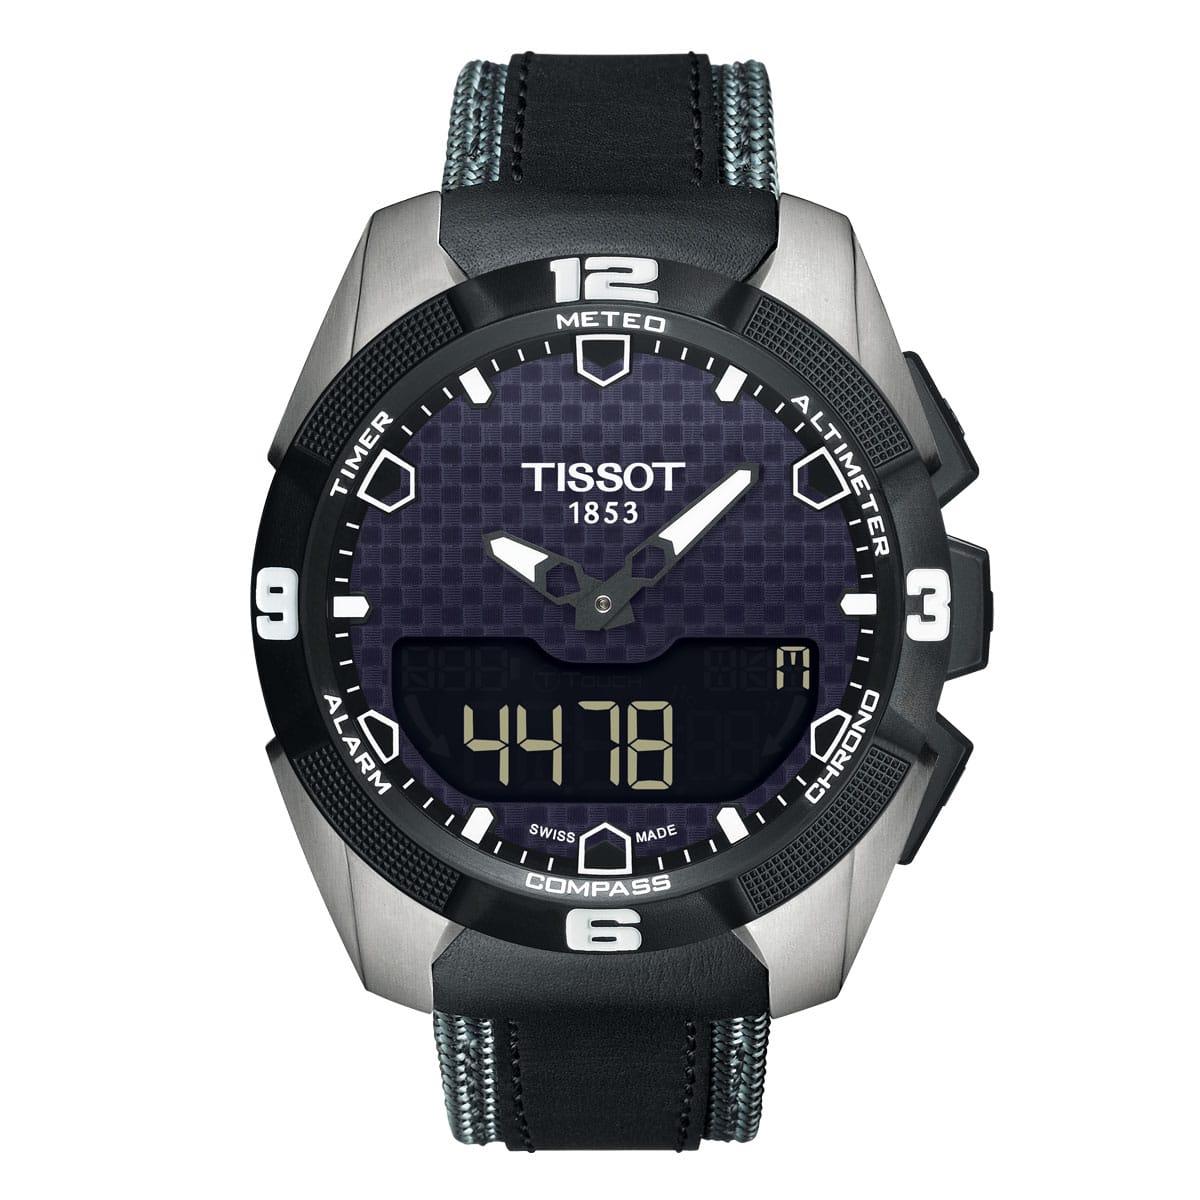 Tissot - Tissot T-Touch Expert Solar